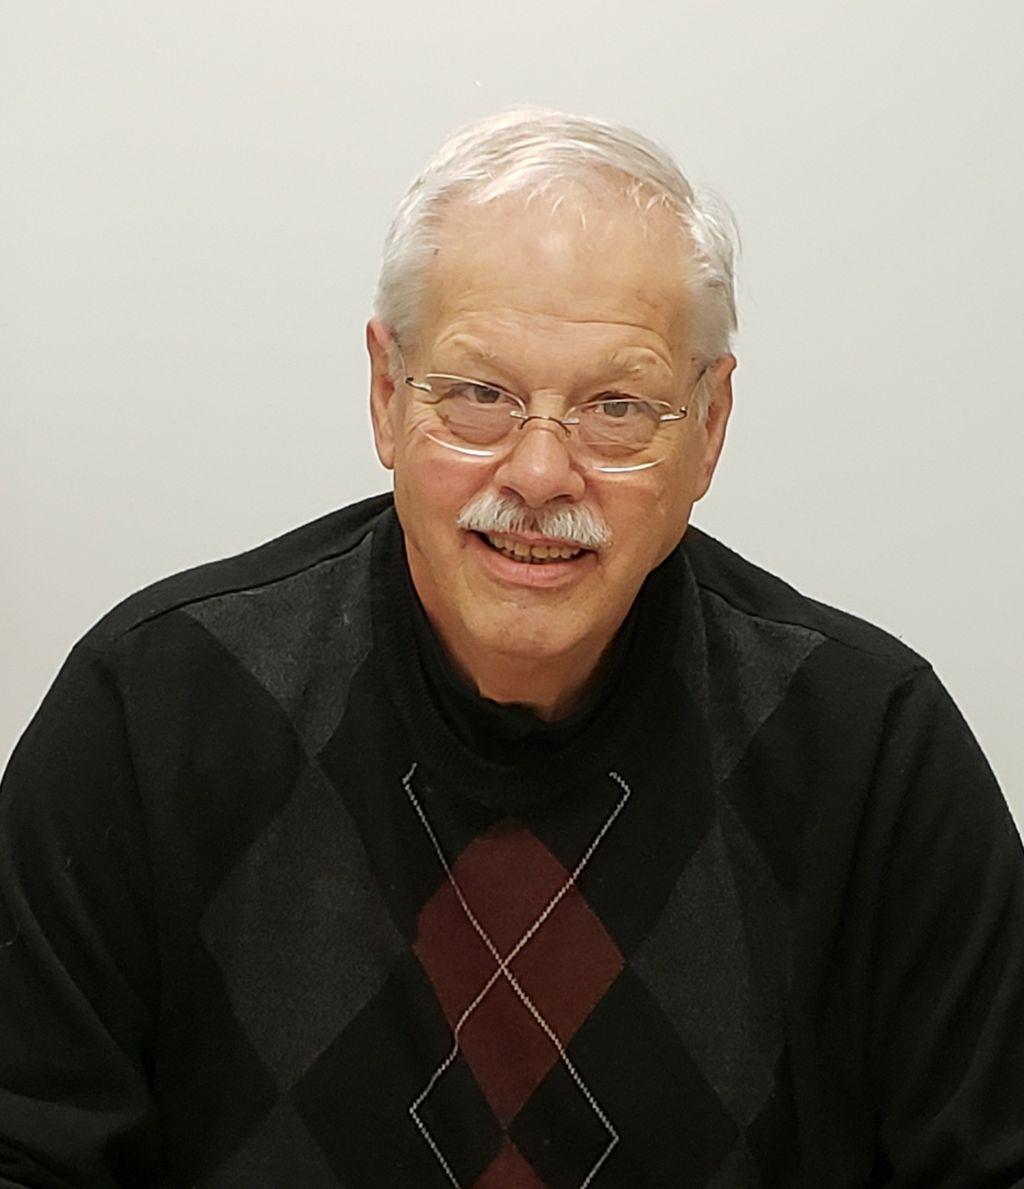 Bill Heinz